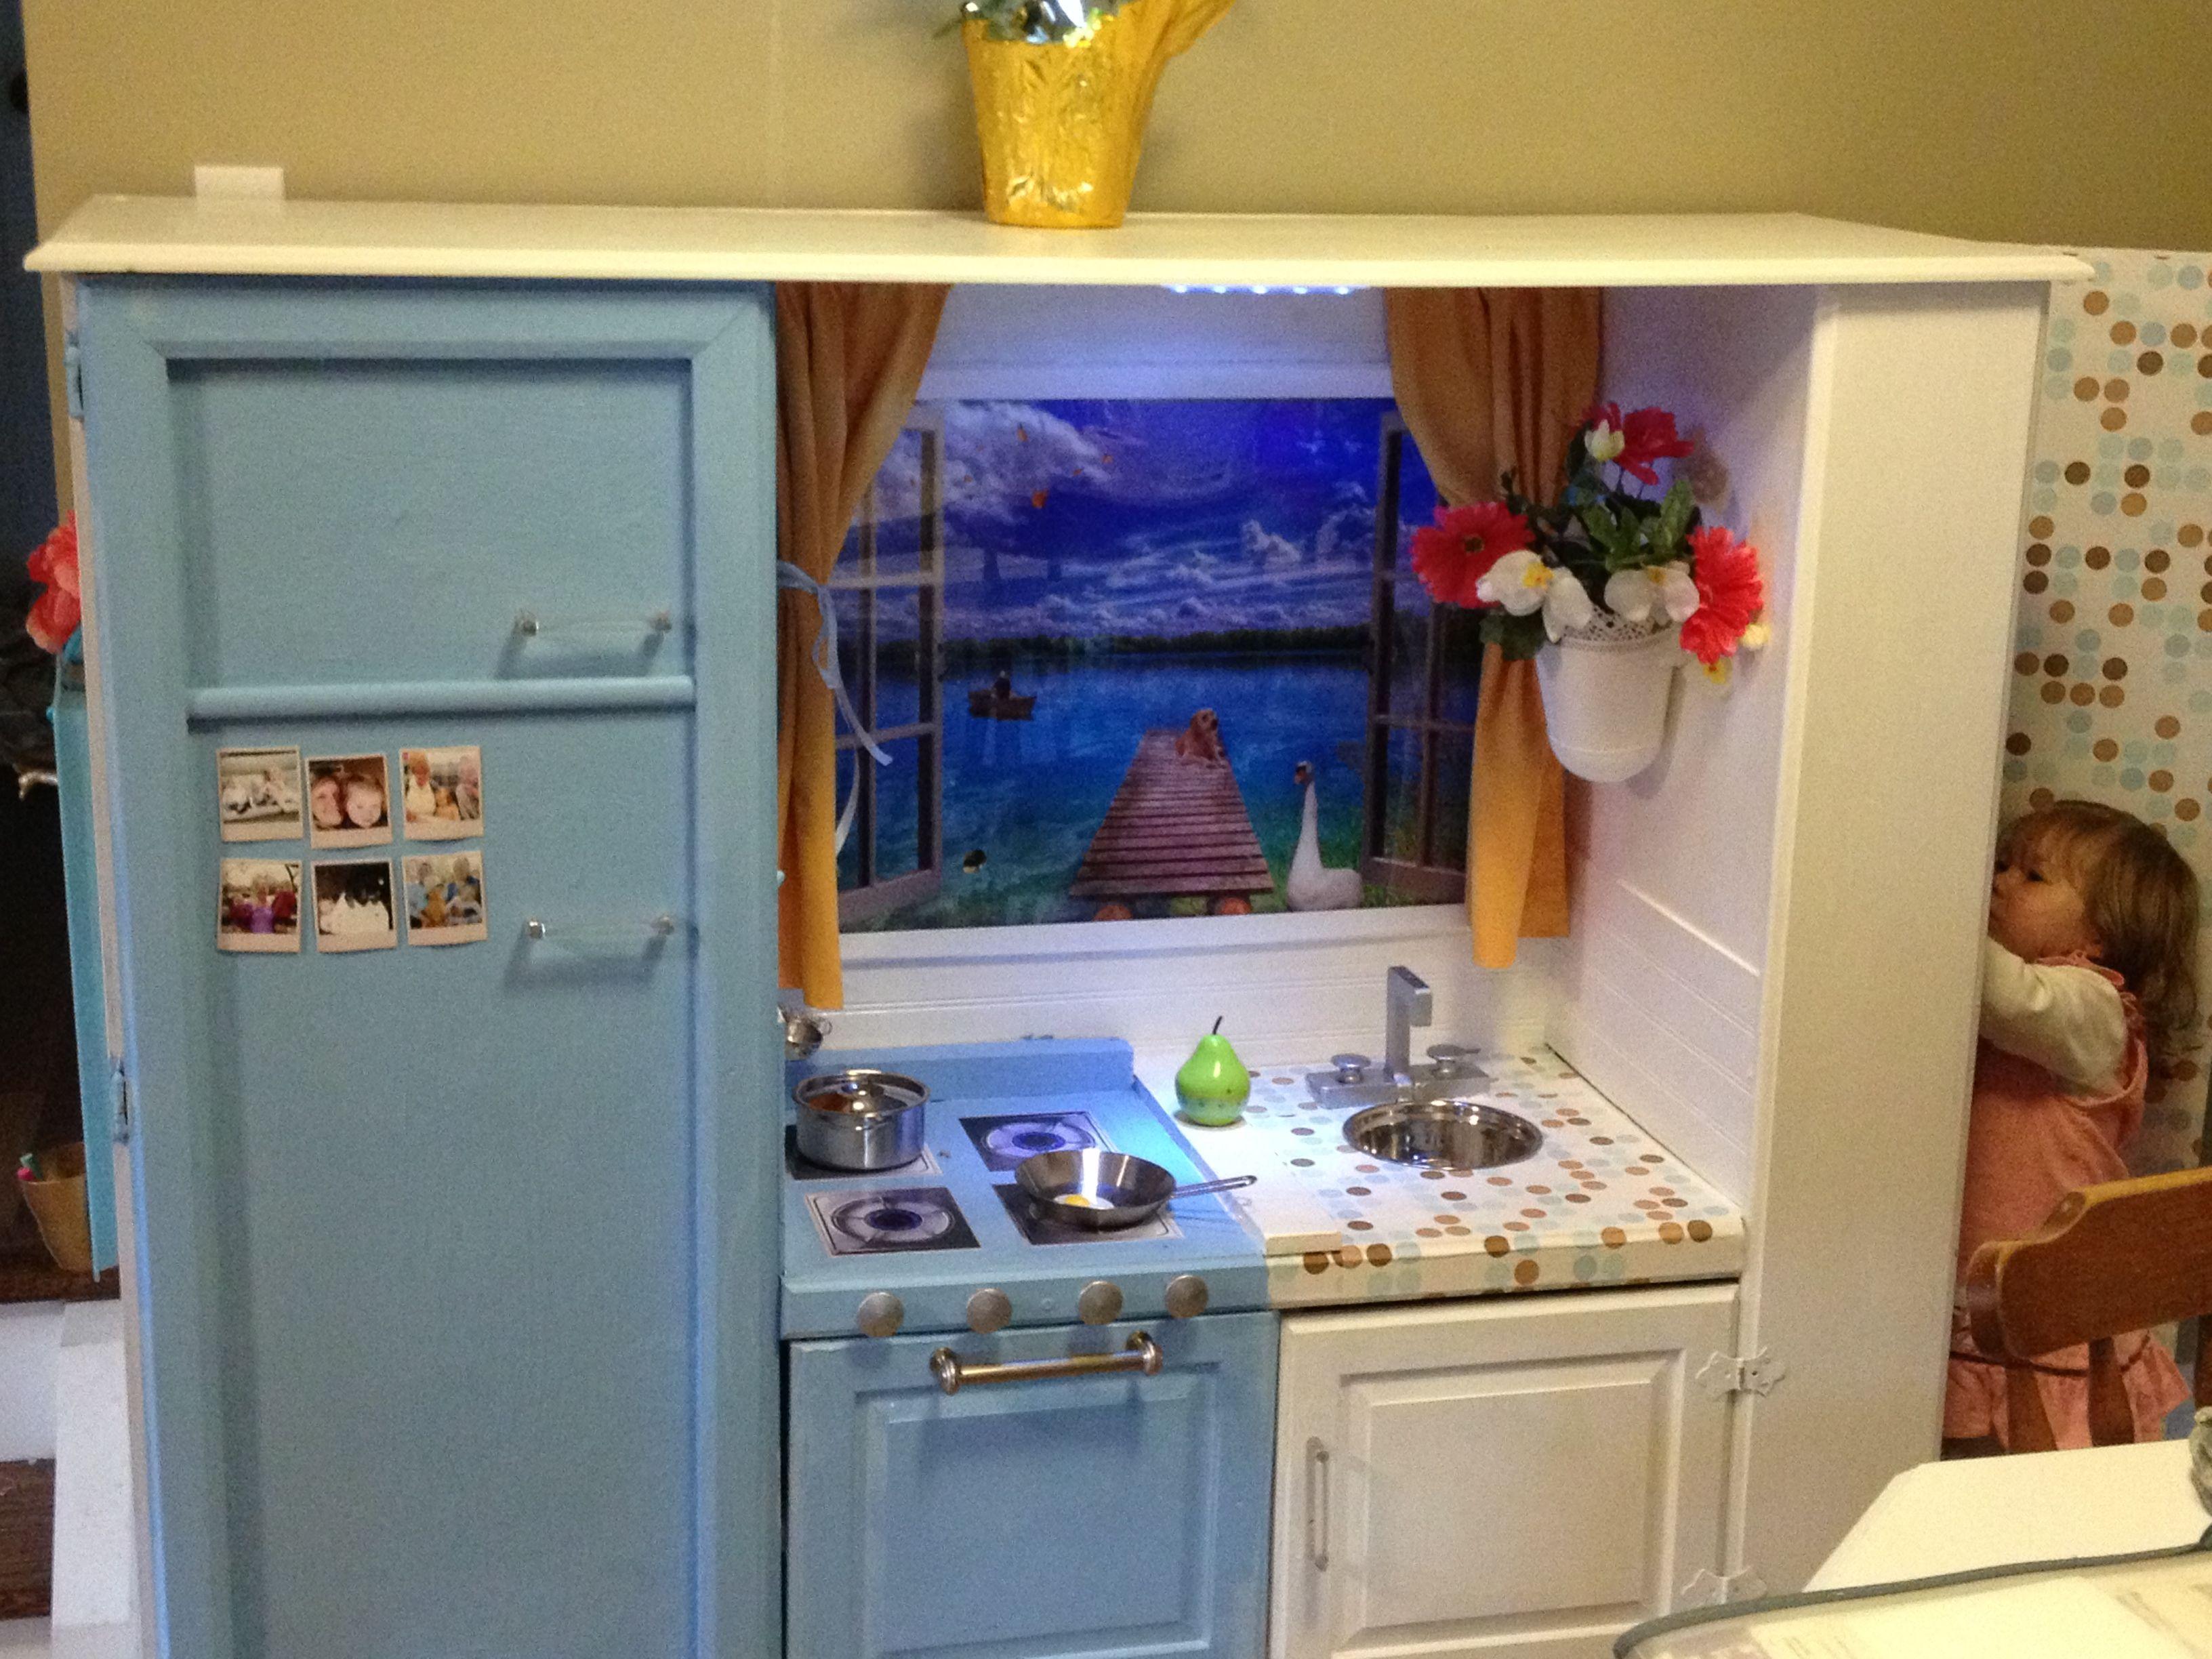 diy kids kitchen from old entertainment unit d nette. Black Bedroom Furniture Sets. Home Design Ideas